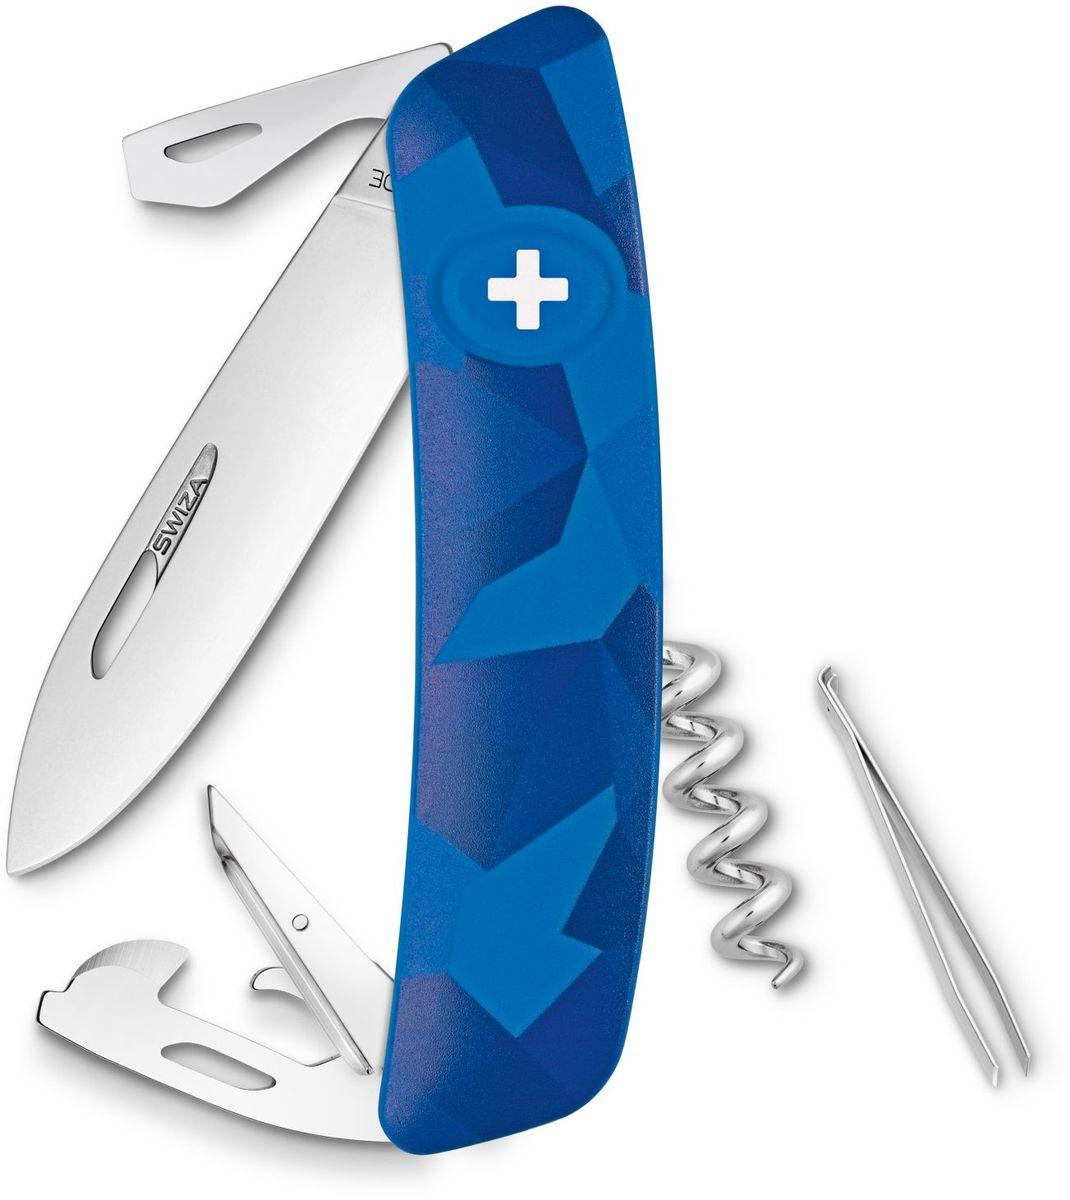 Нож швейцарский SWIZA С03, цвет: синий, длина клинка 7,5 см